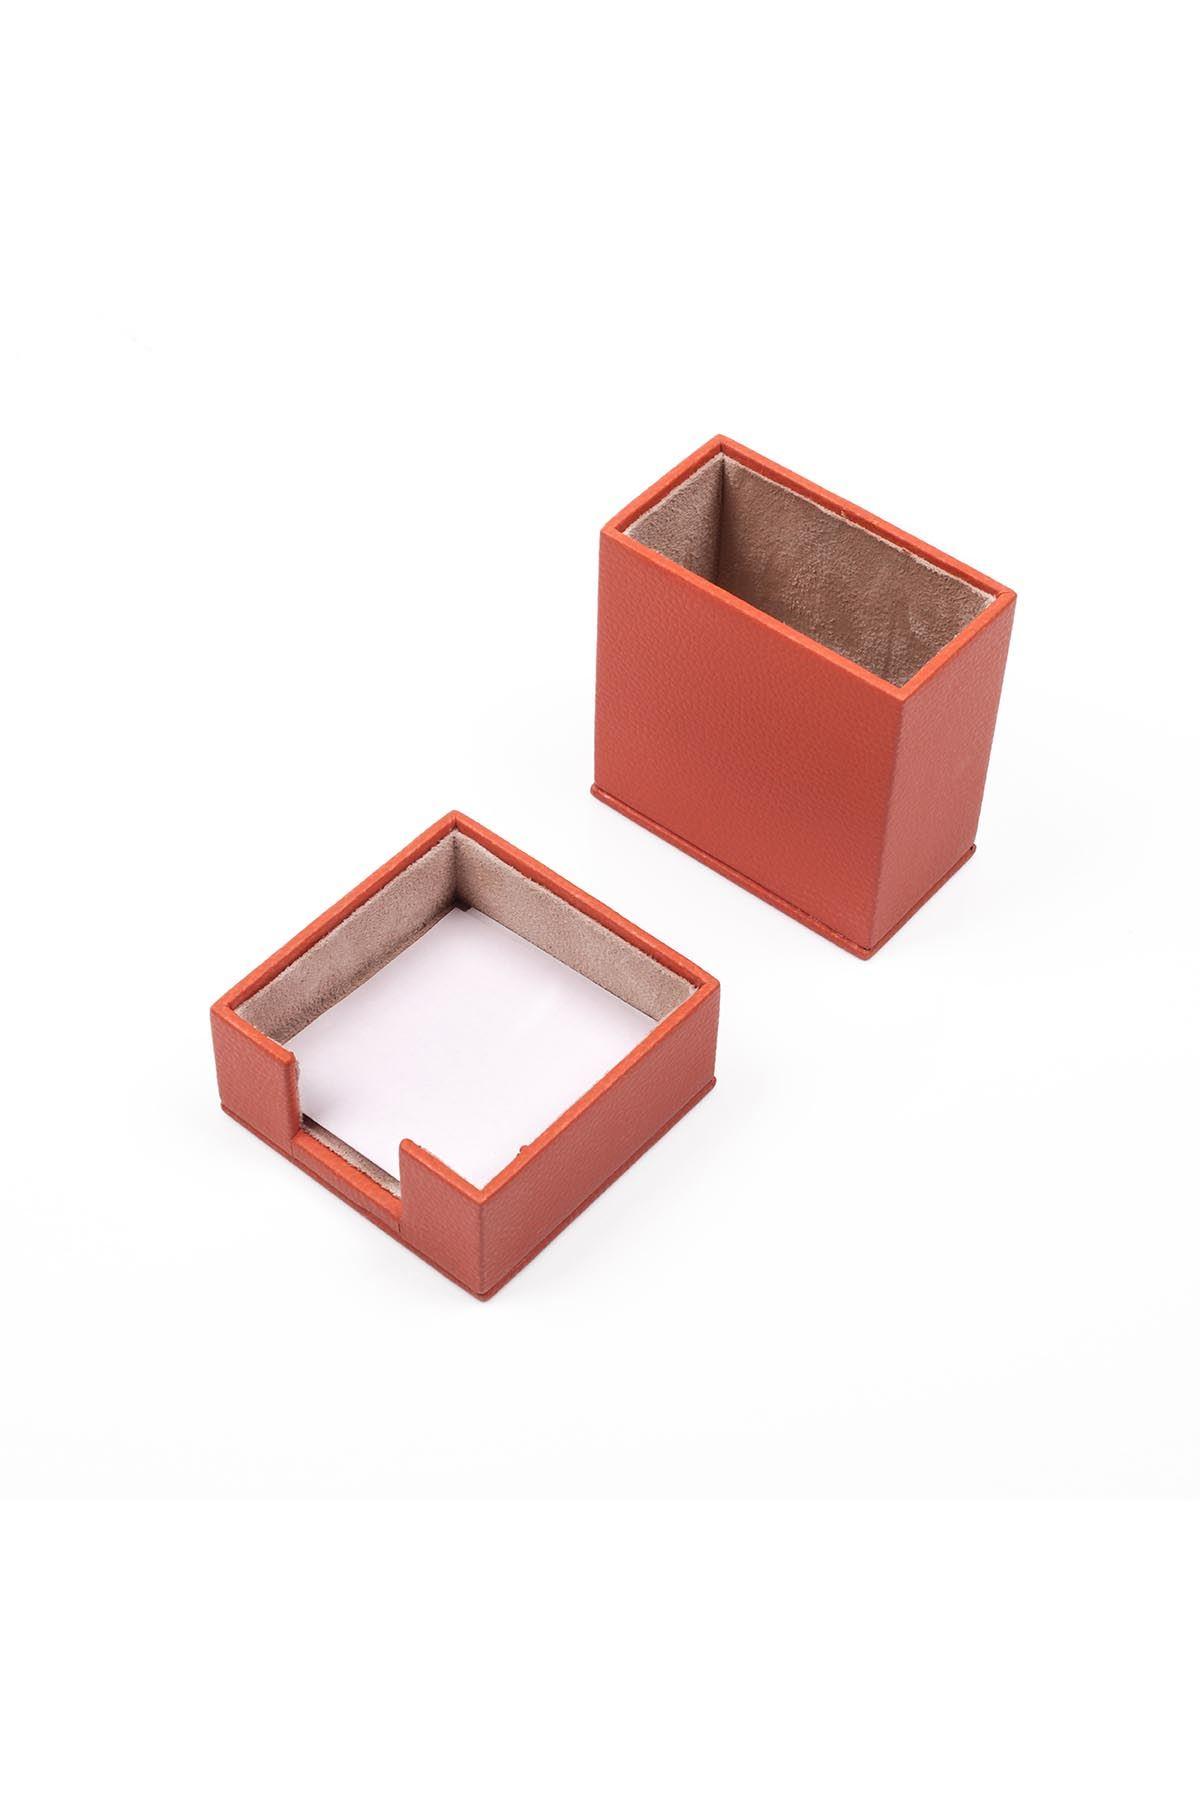 Leather Desk Accessories set of 2 Orange| Desk Set Accessories | Desktop Accessories | Desk Accessories | Desk Organizers